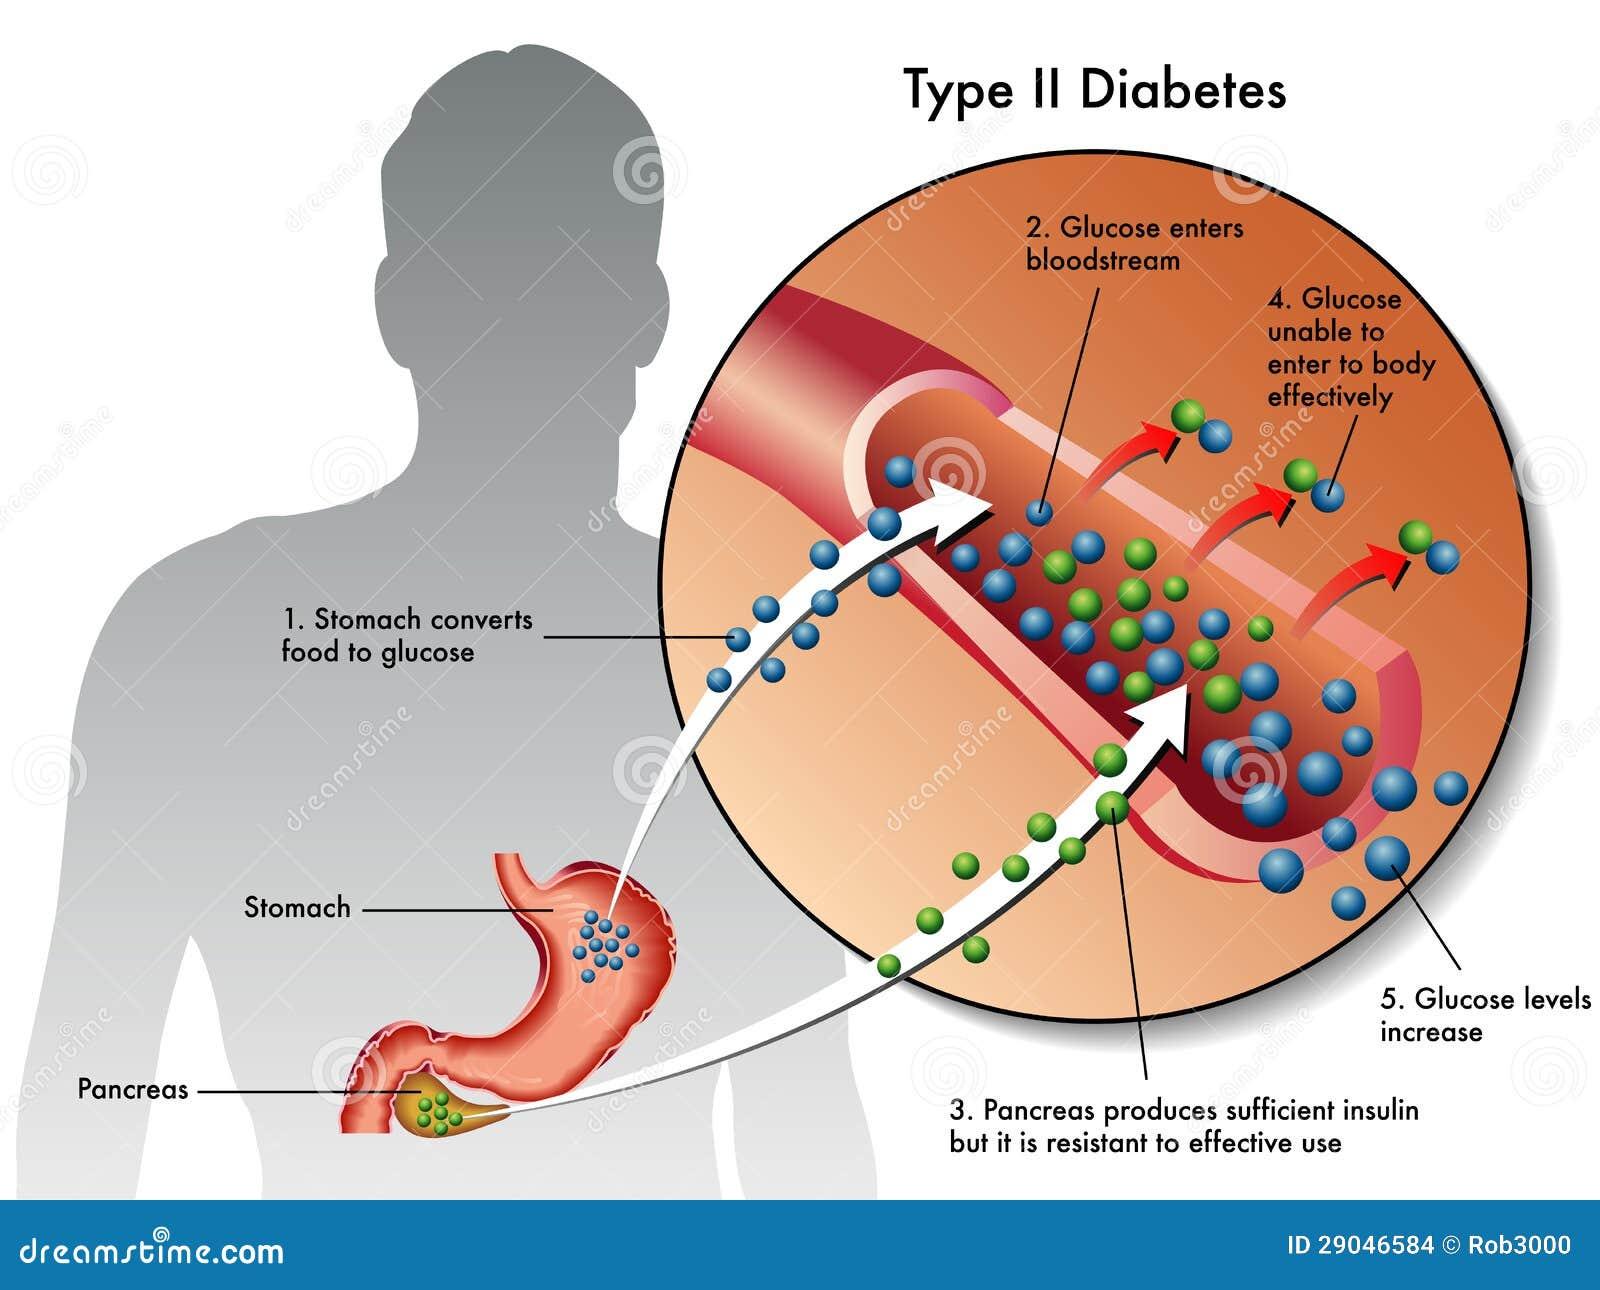 type 2 diabetes stock images - image: 29046584, Skeleton